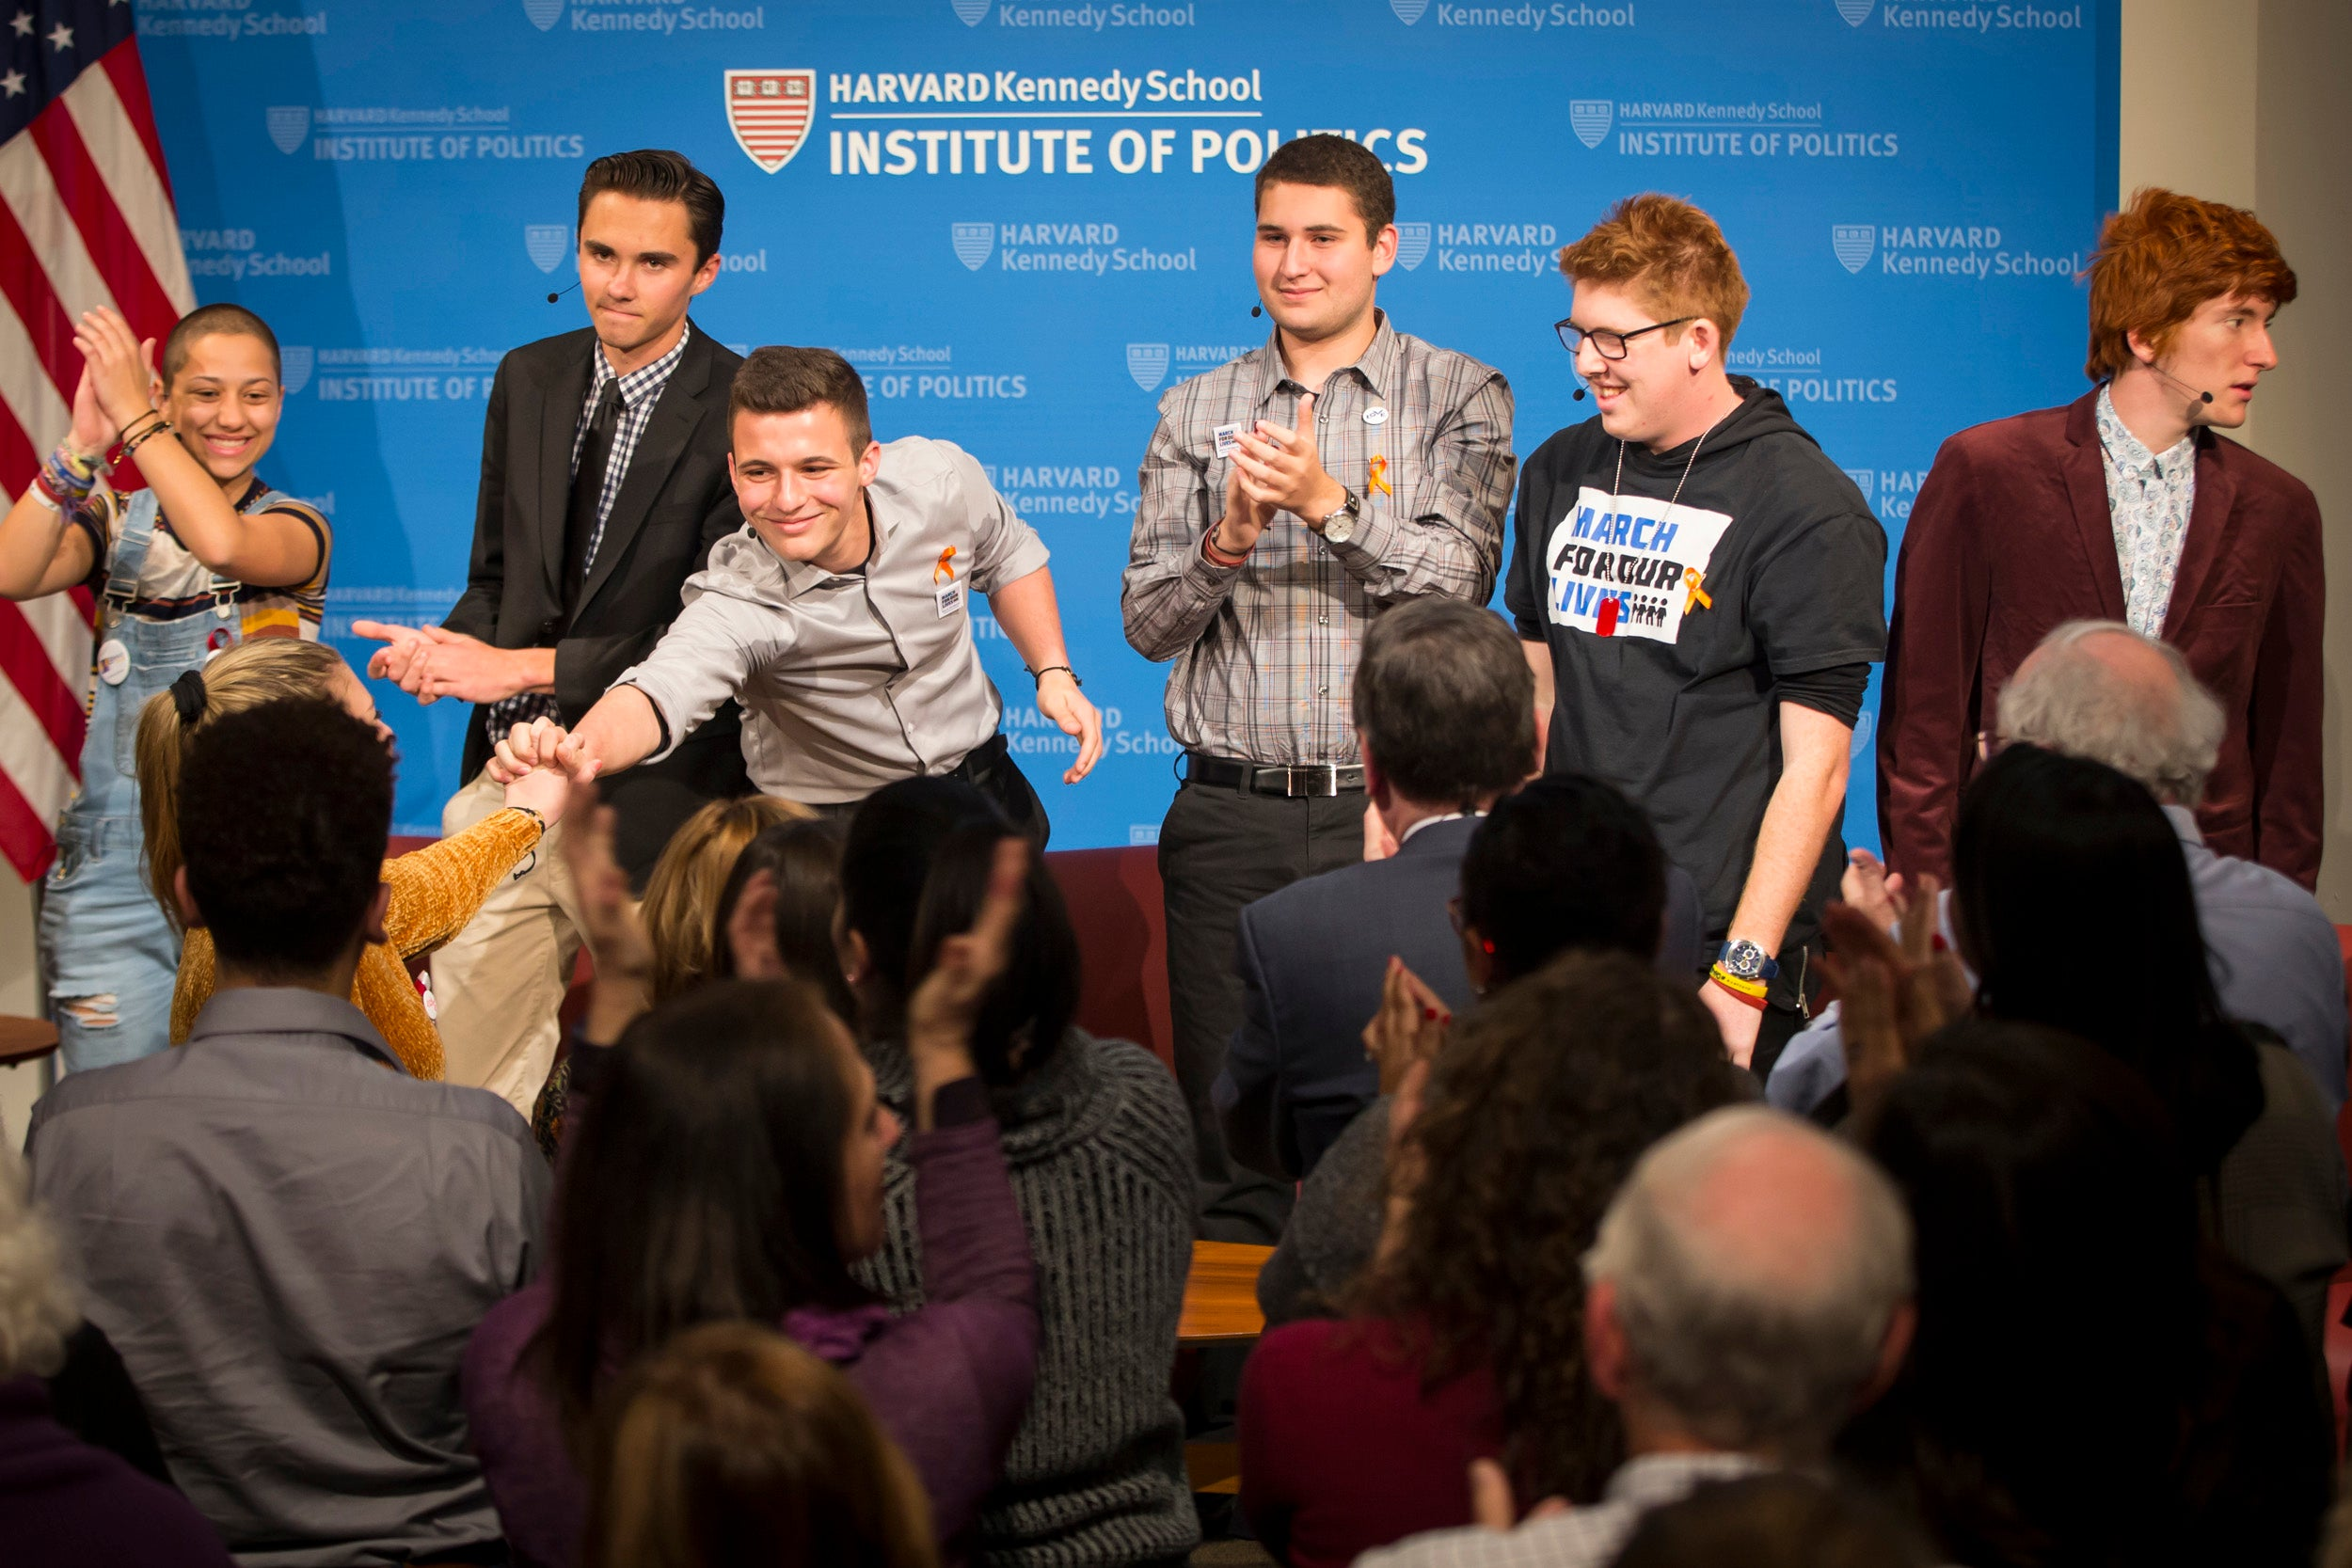 Emma Gonzalez, David Hogg, Cameron Kasky, Alex Wind, Matt Deitsch, and Ryan Deitsch.